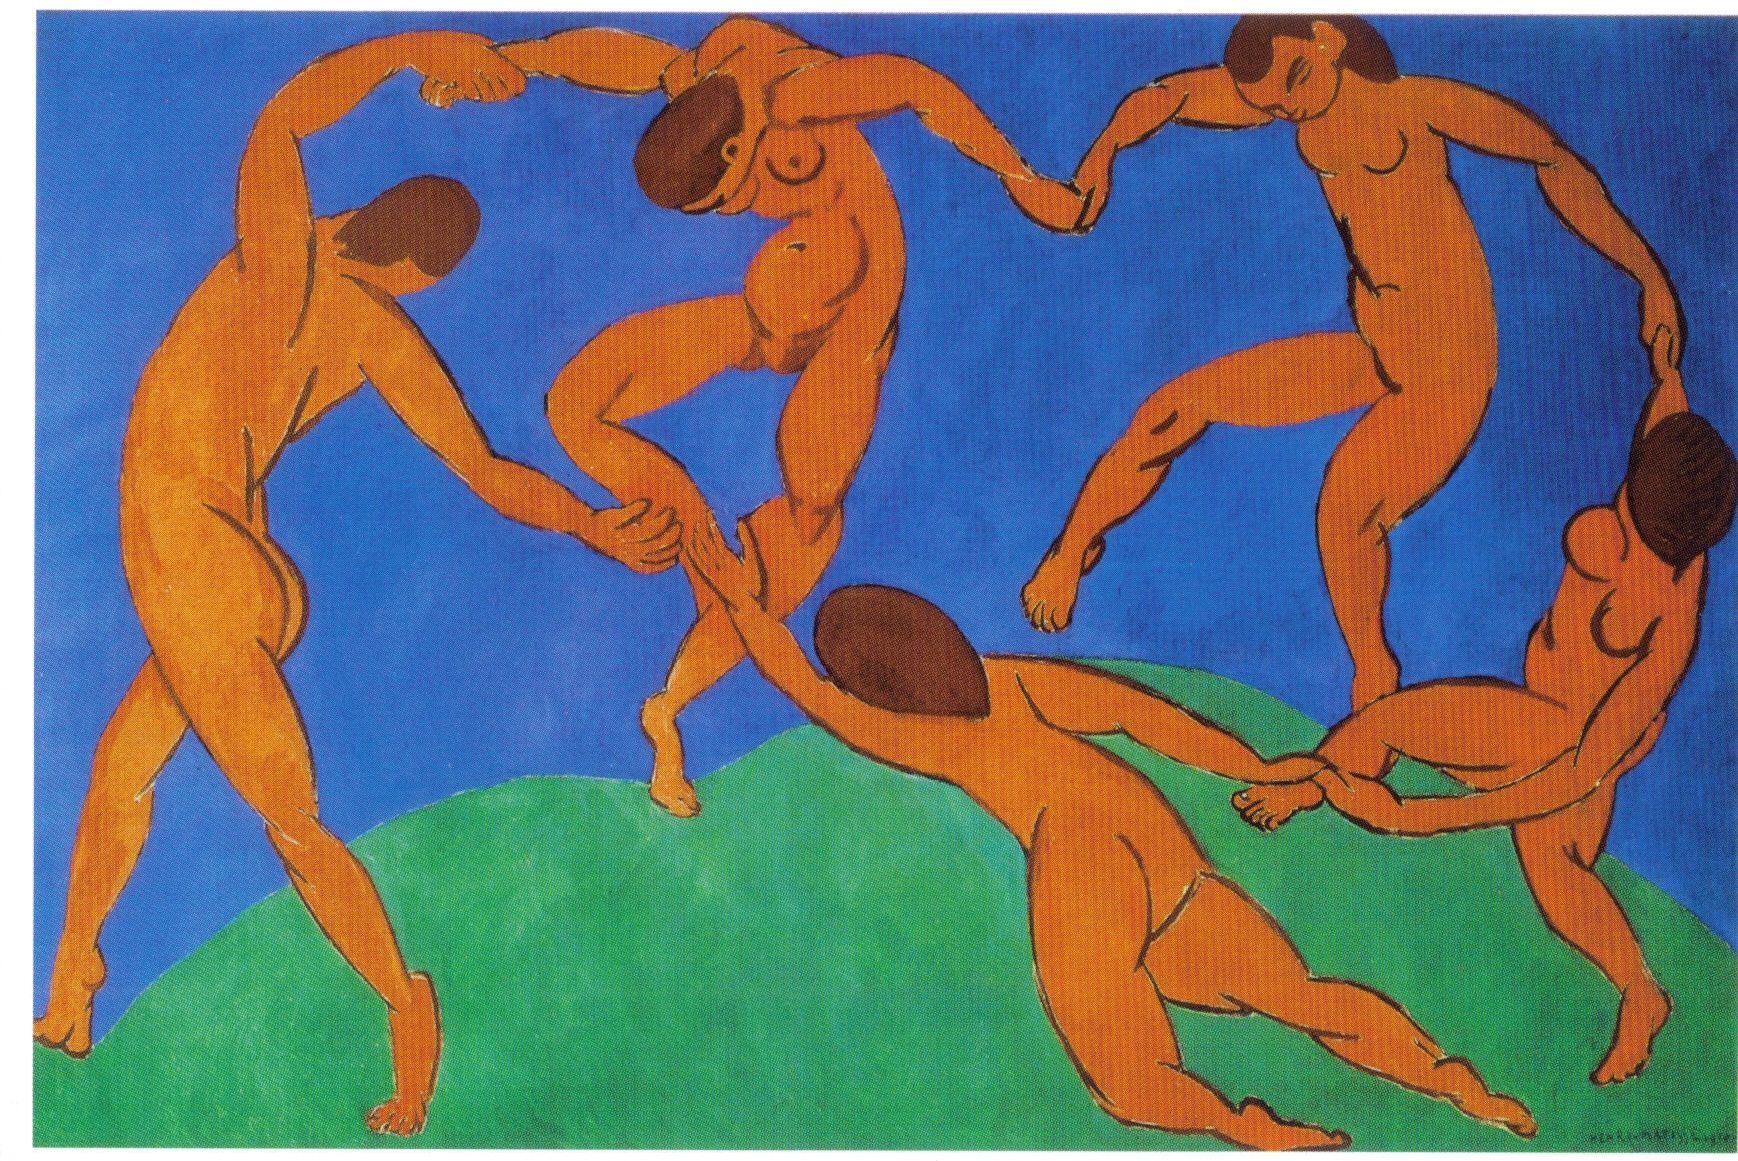 Henri Matisse - La Danza II (1910). Fauvismo. Óleo sobre tela de 260 x 391 cm. Museo del Hermitage (San Petesburgo), Rusia